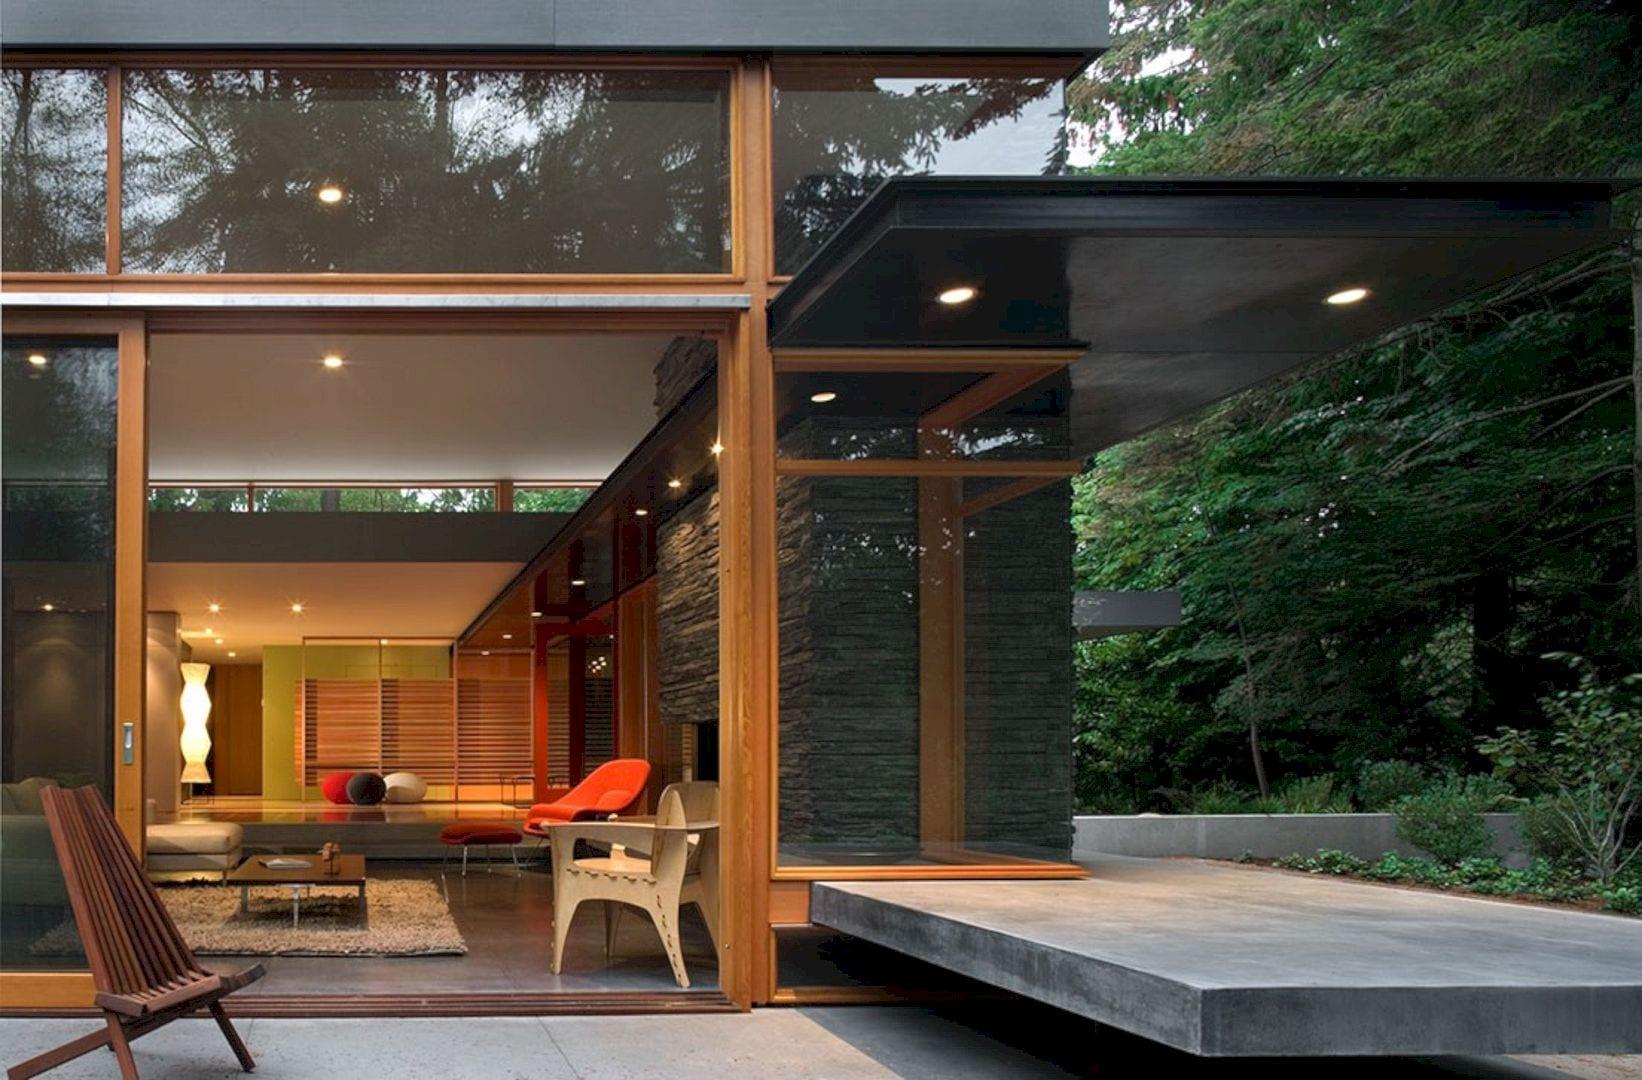 Woodway Residence By Bohlin Cywinski Jackson 4